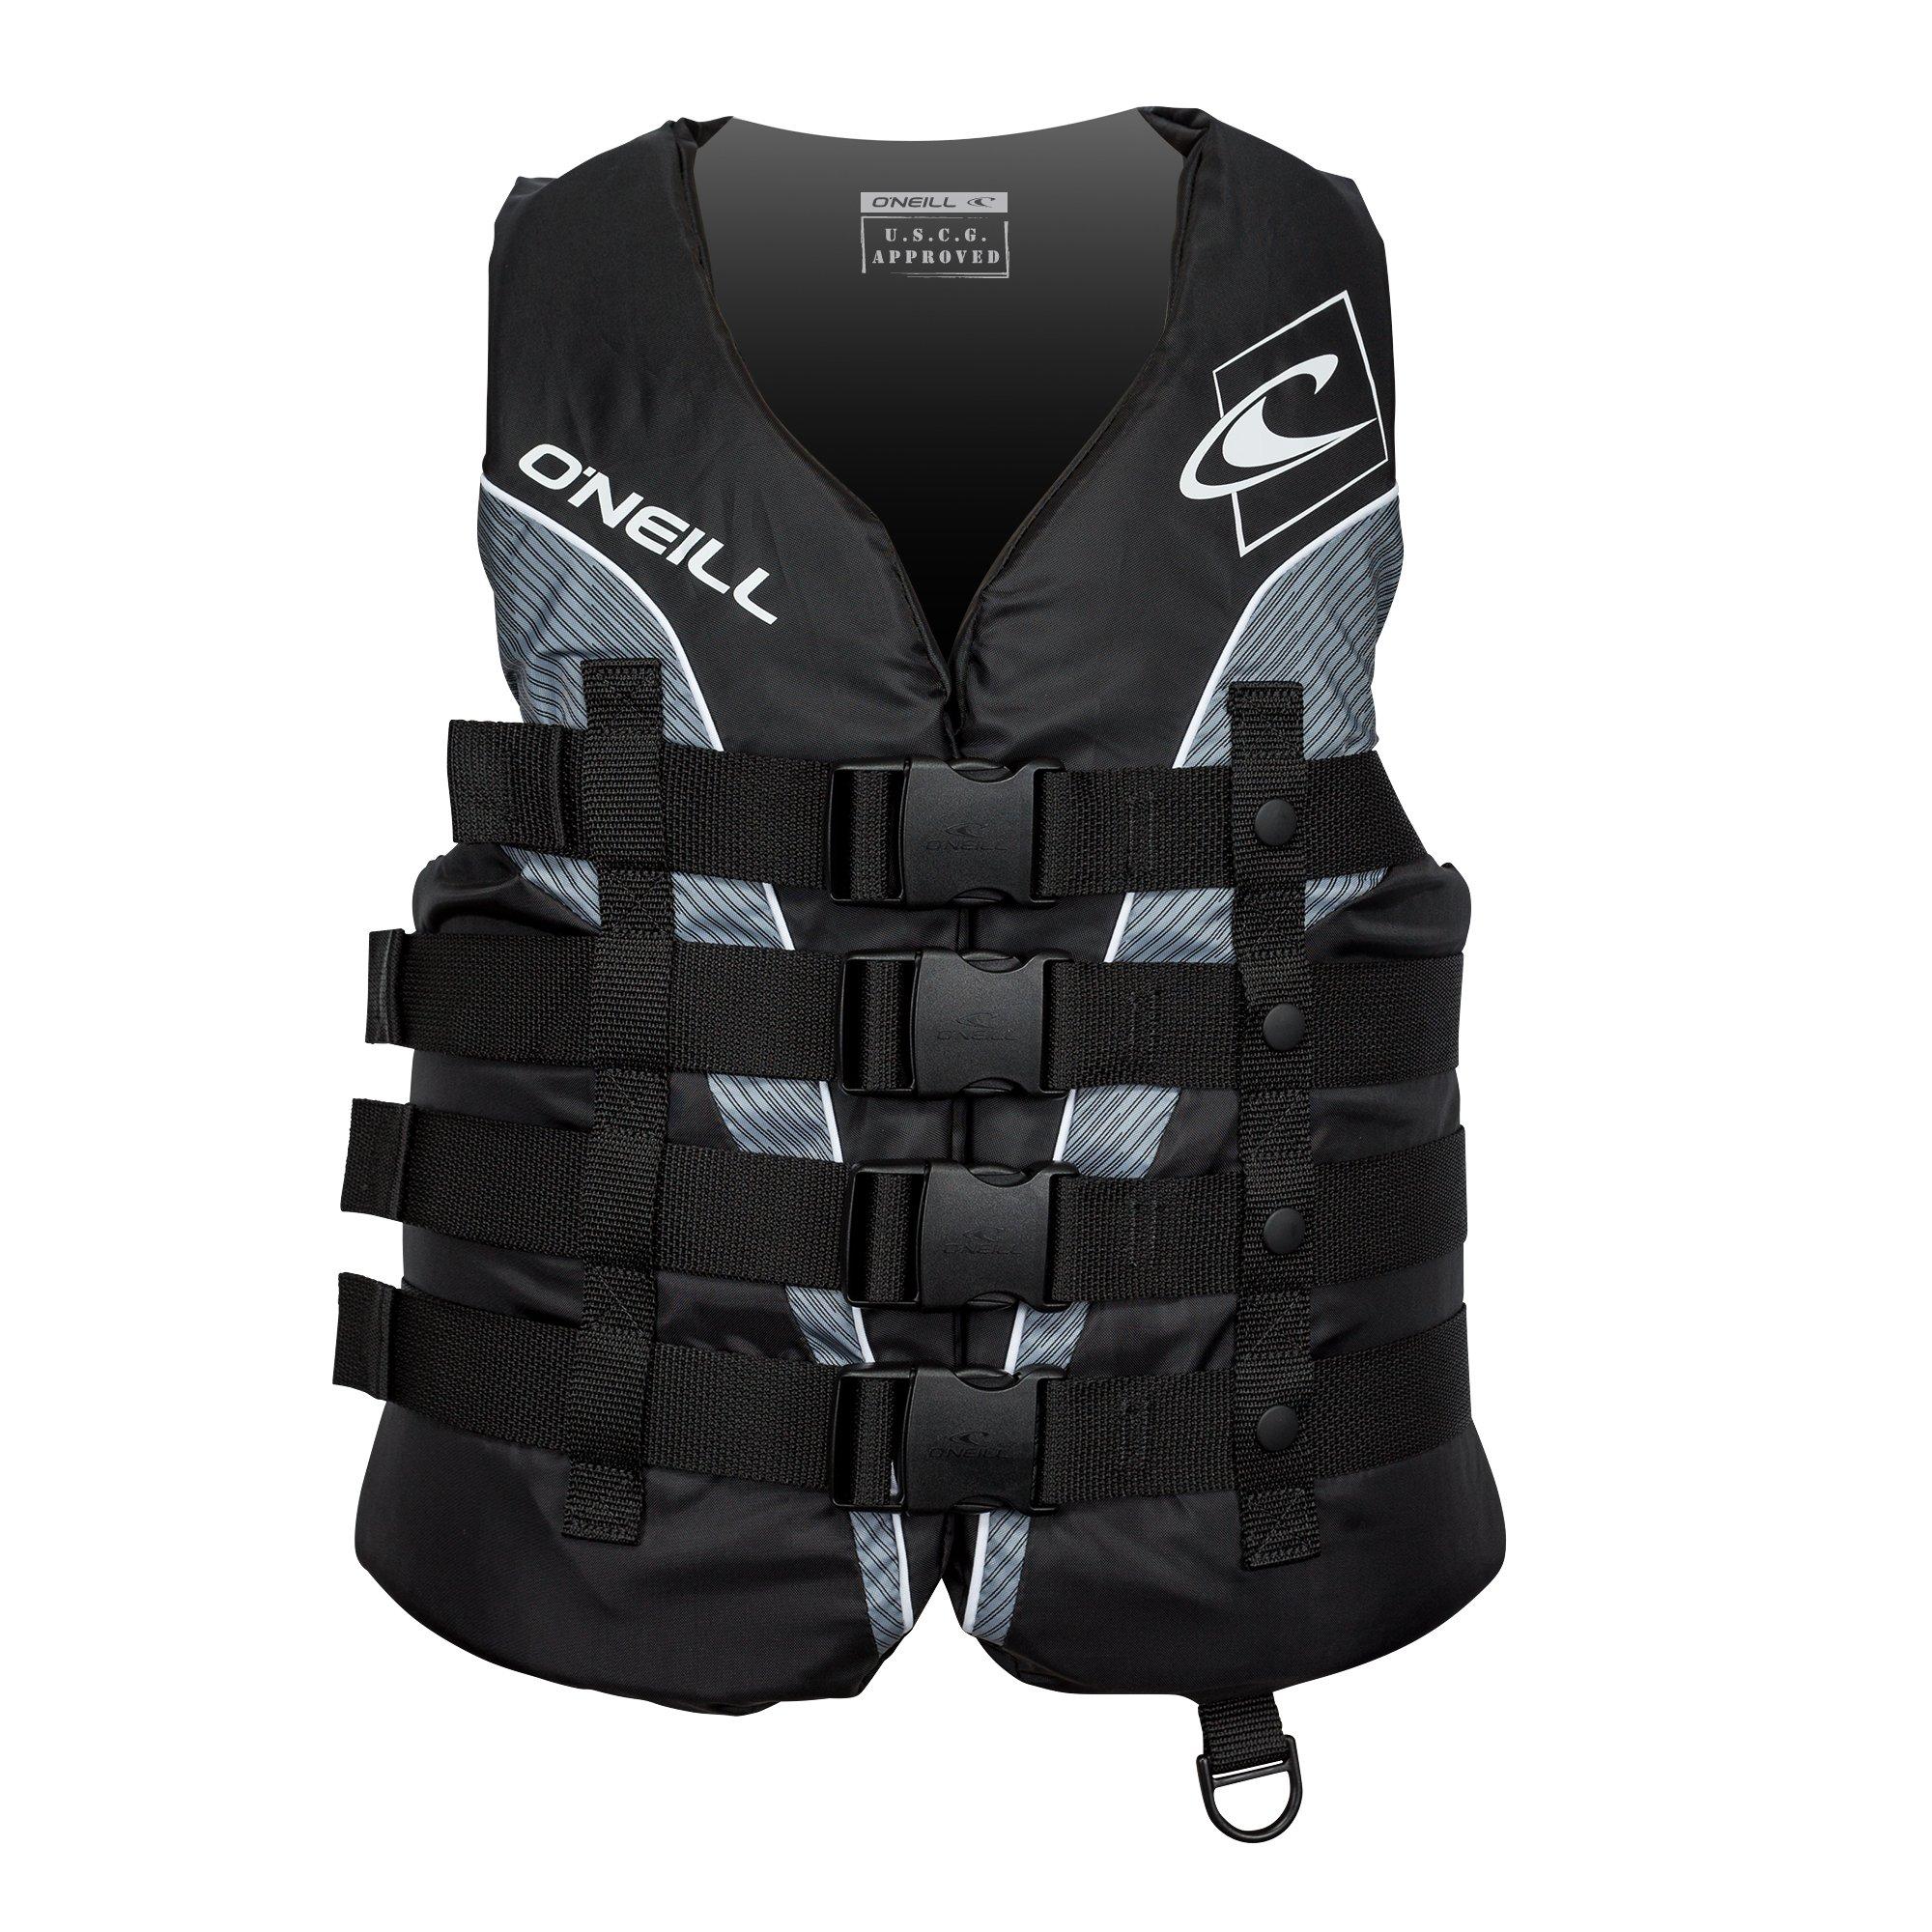 O'Neill   Men's Superlite USCG Life Vest,Black/Black/Smoke/White,XX-Large by O'Neill Wetsuits